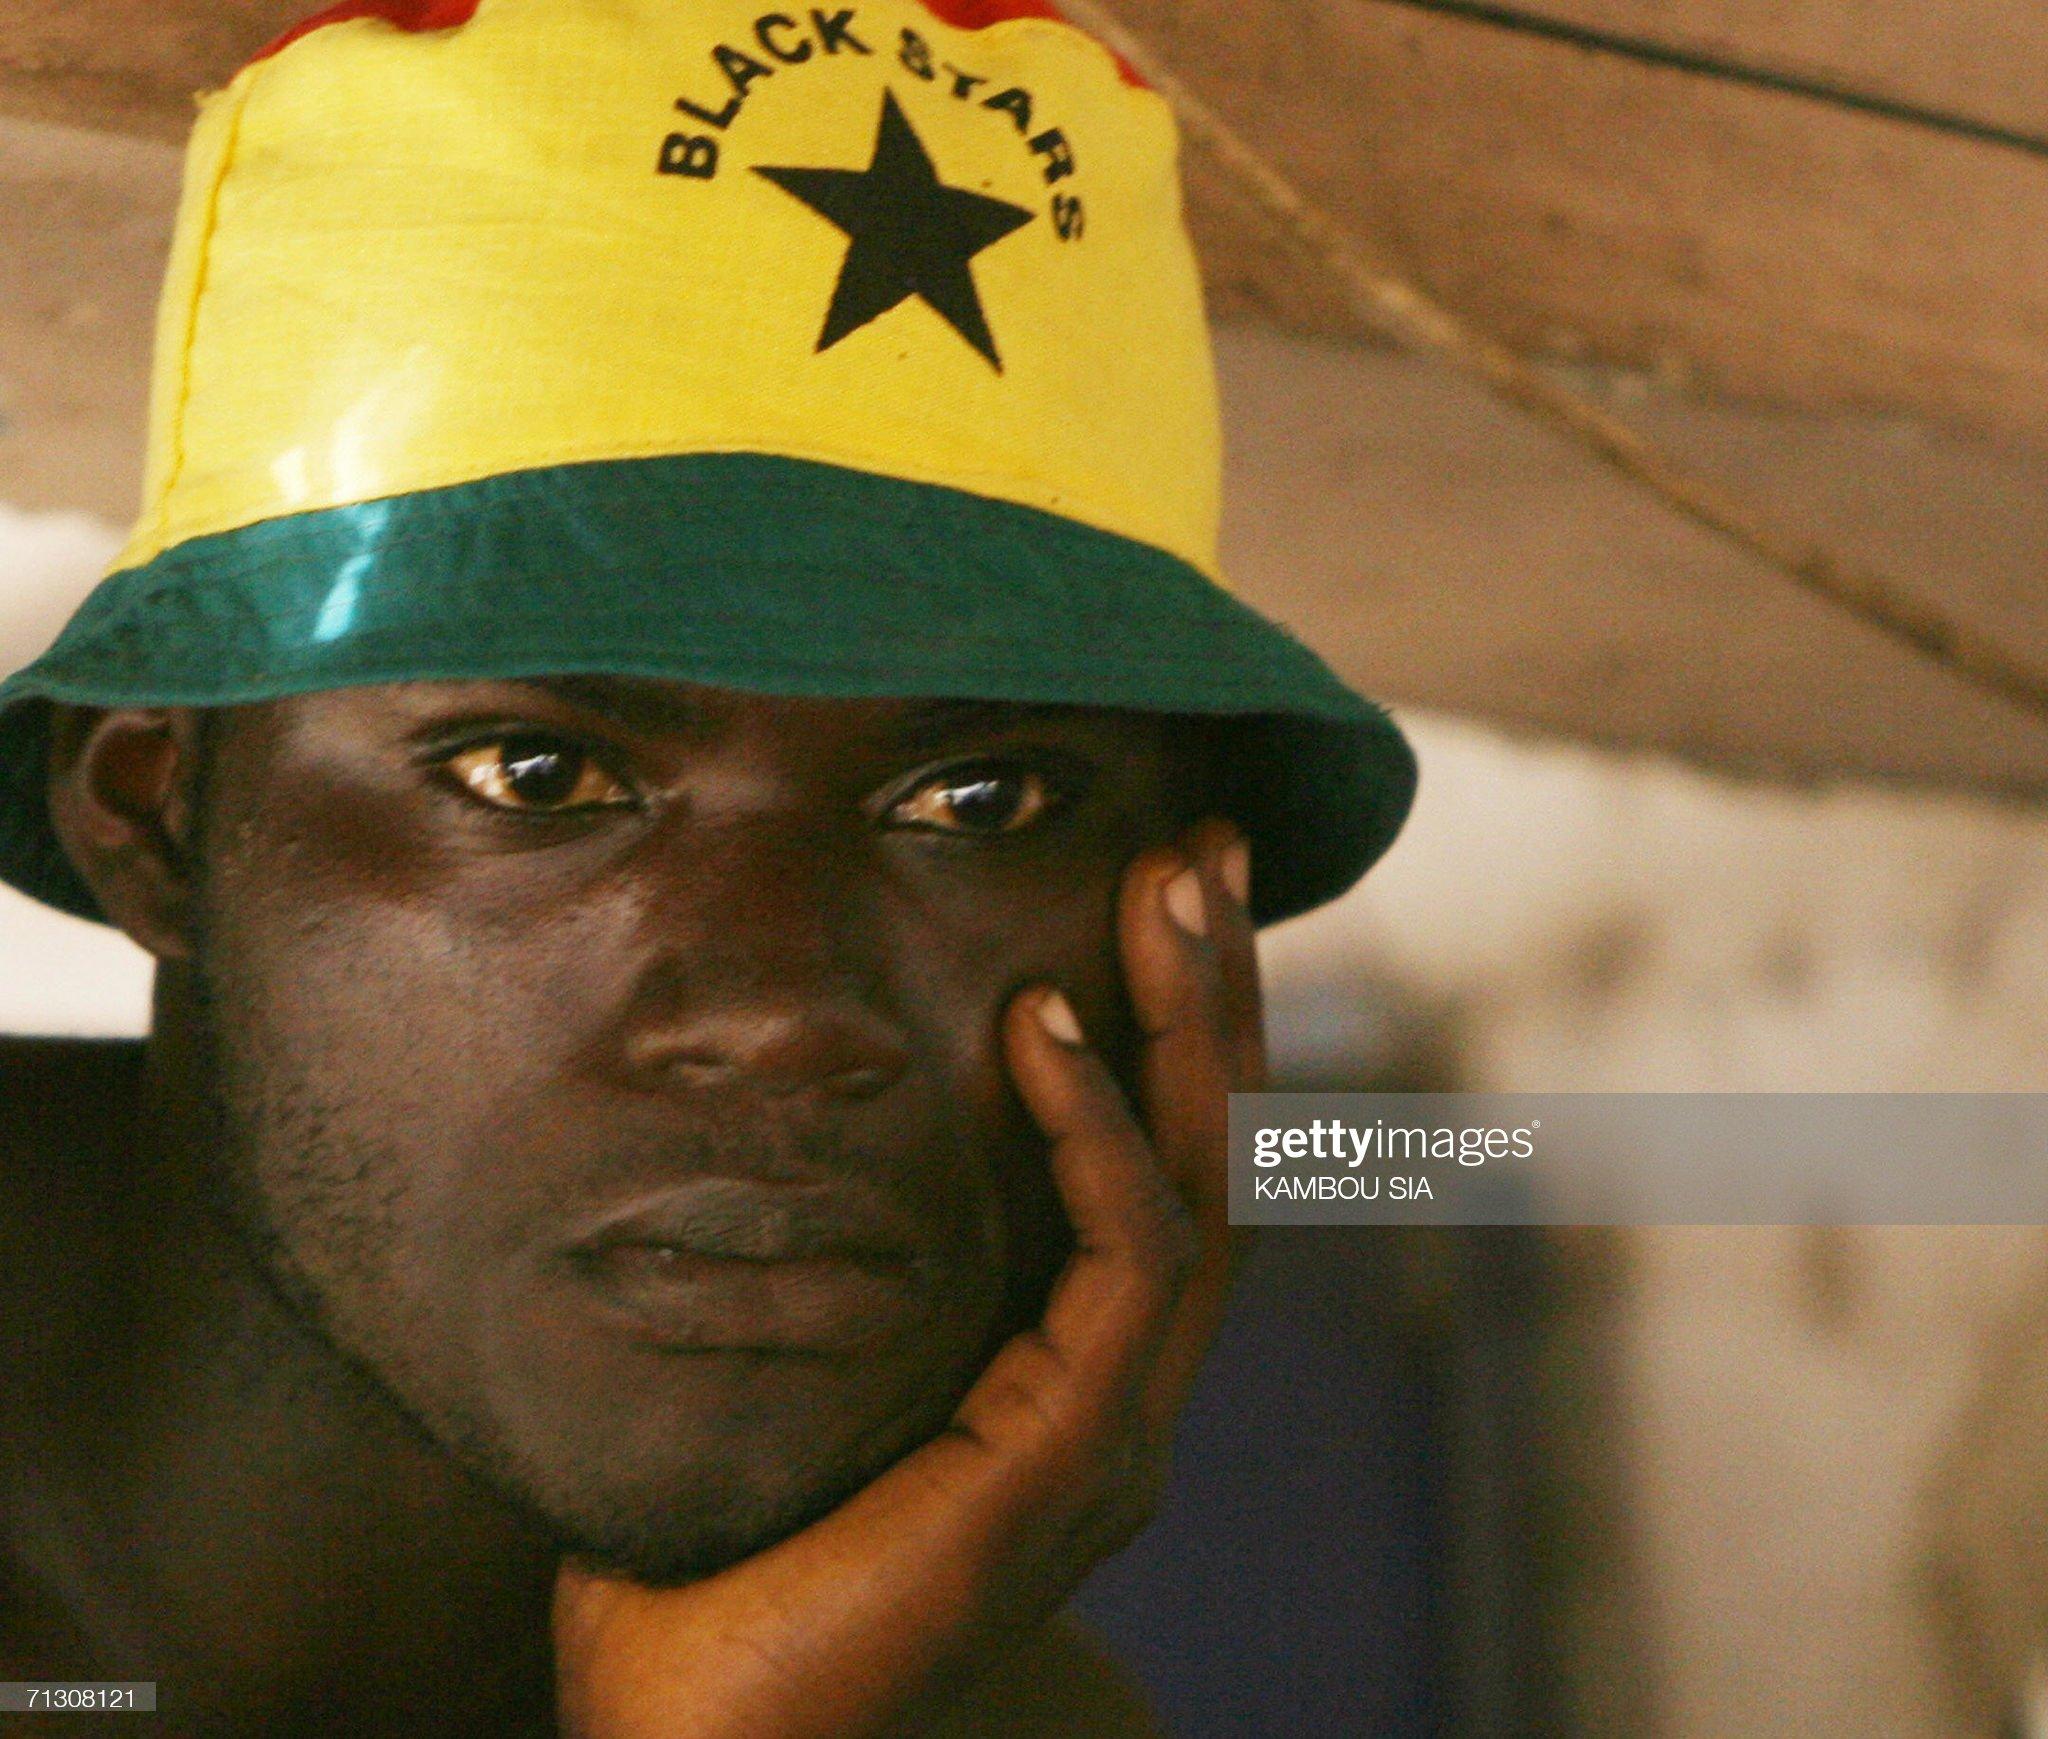 A young Ghanaian football fan looks sad : News Photo